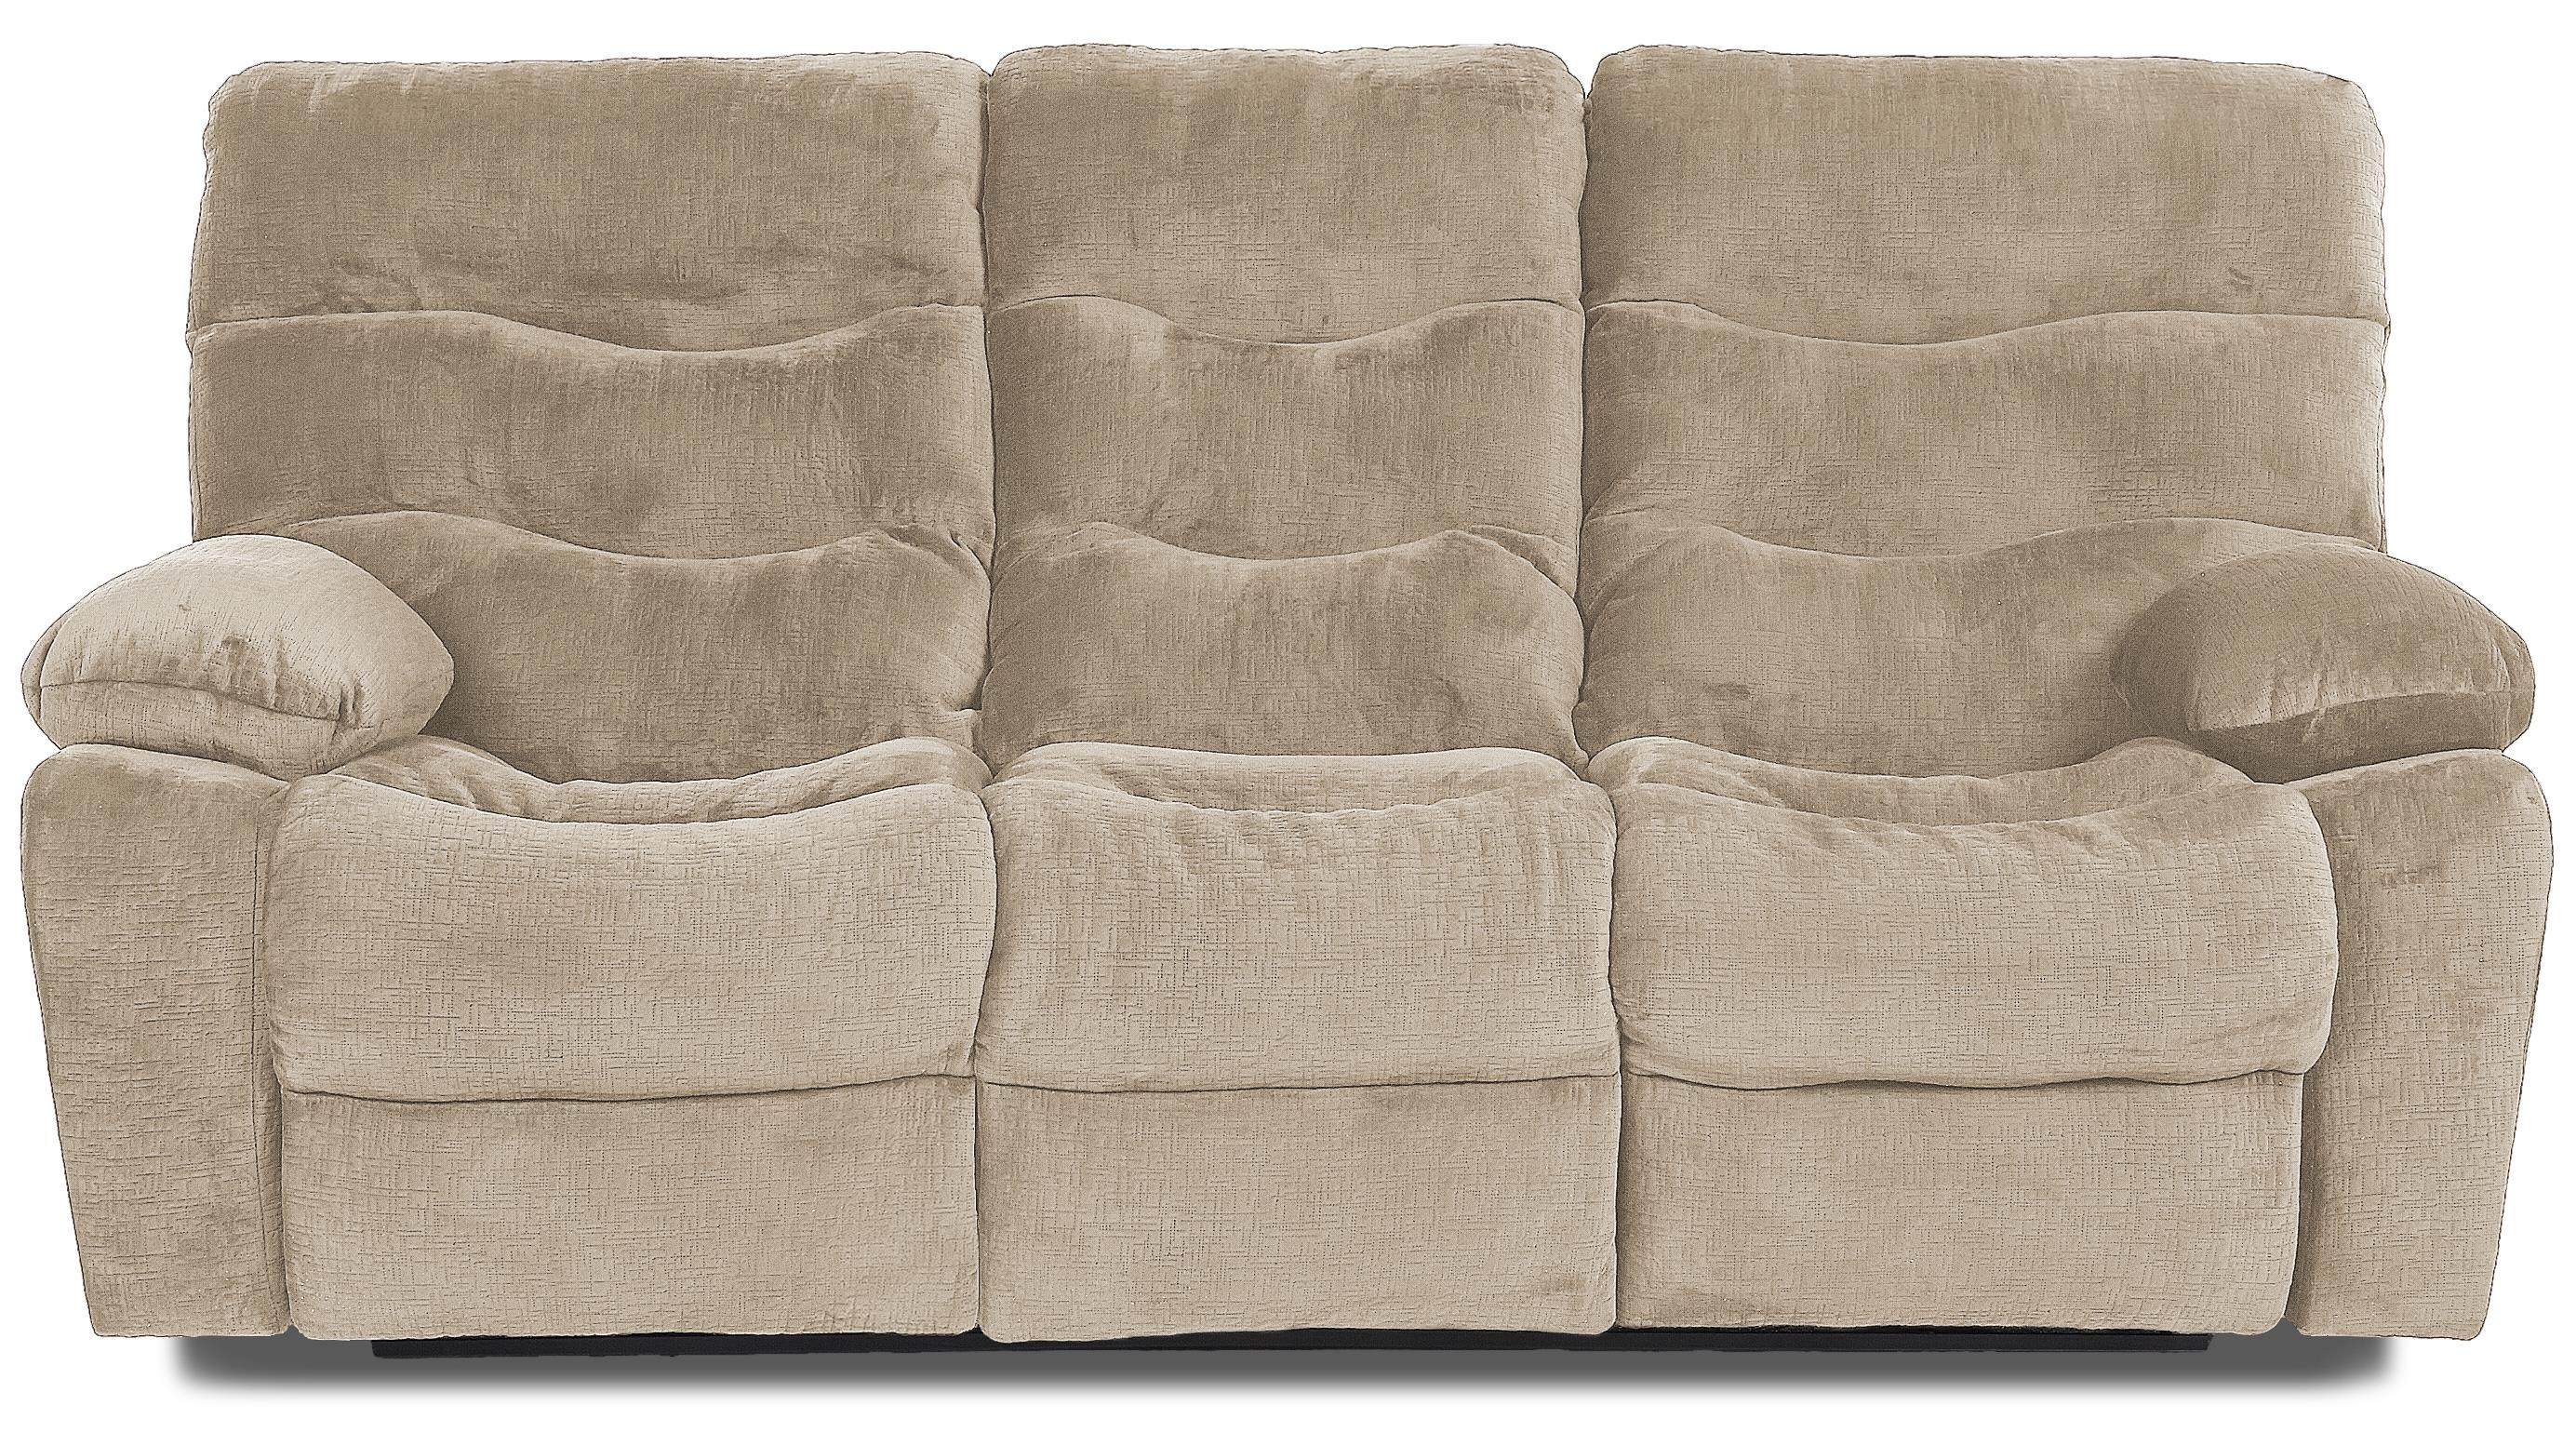 Klaussner Hercules Reclining Sofa - Item Number: 27403 RS-EtchToast